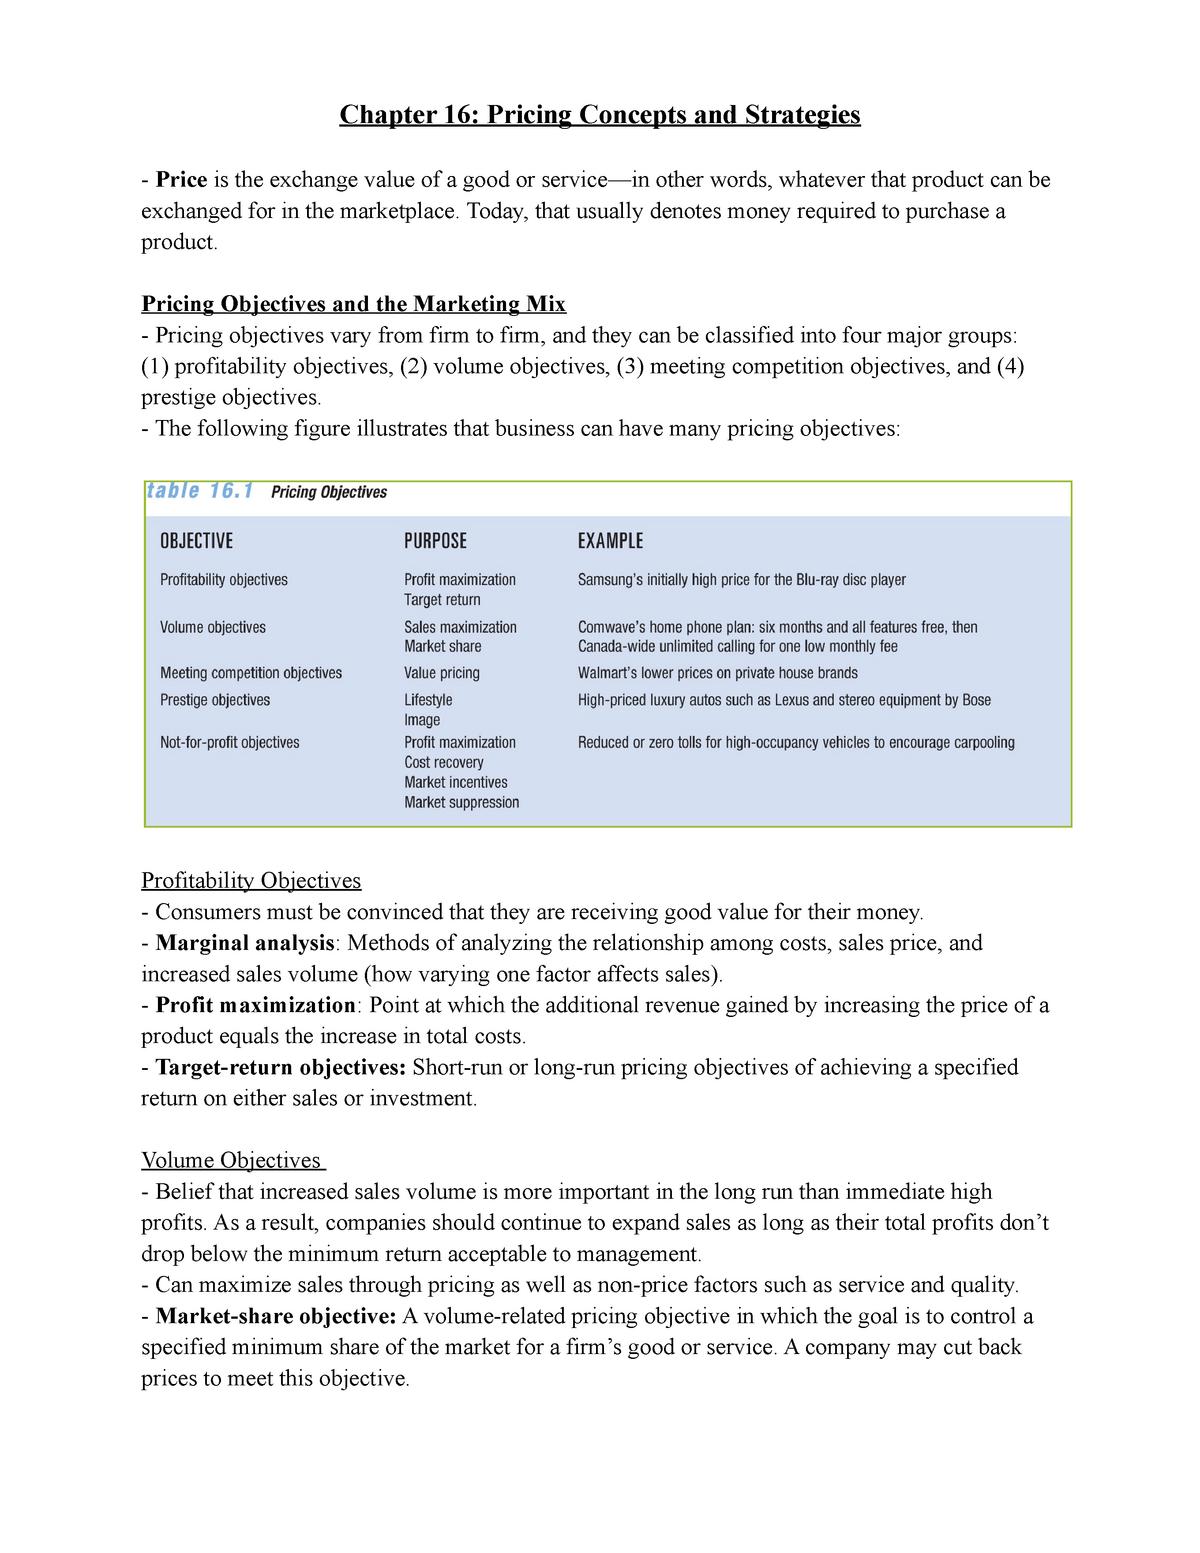 Adms 2200 chapter 16 - Summary Contemporary Marketing - StuDocu